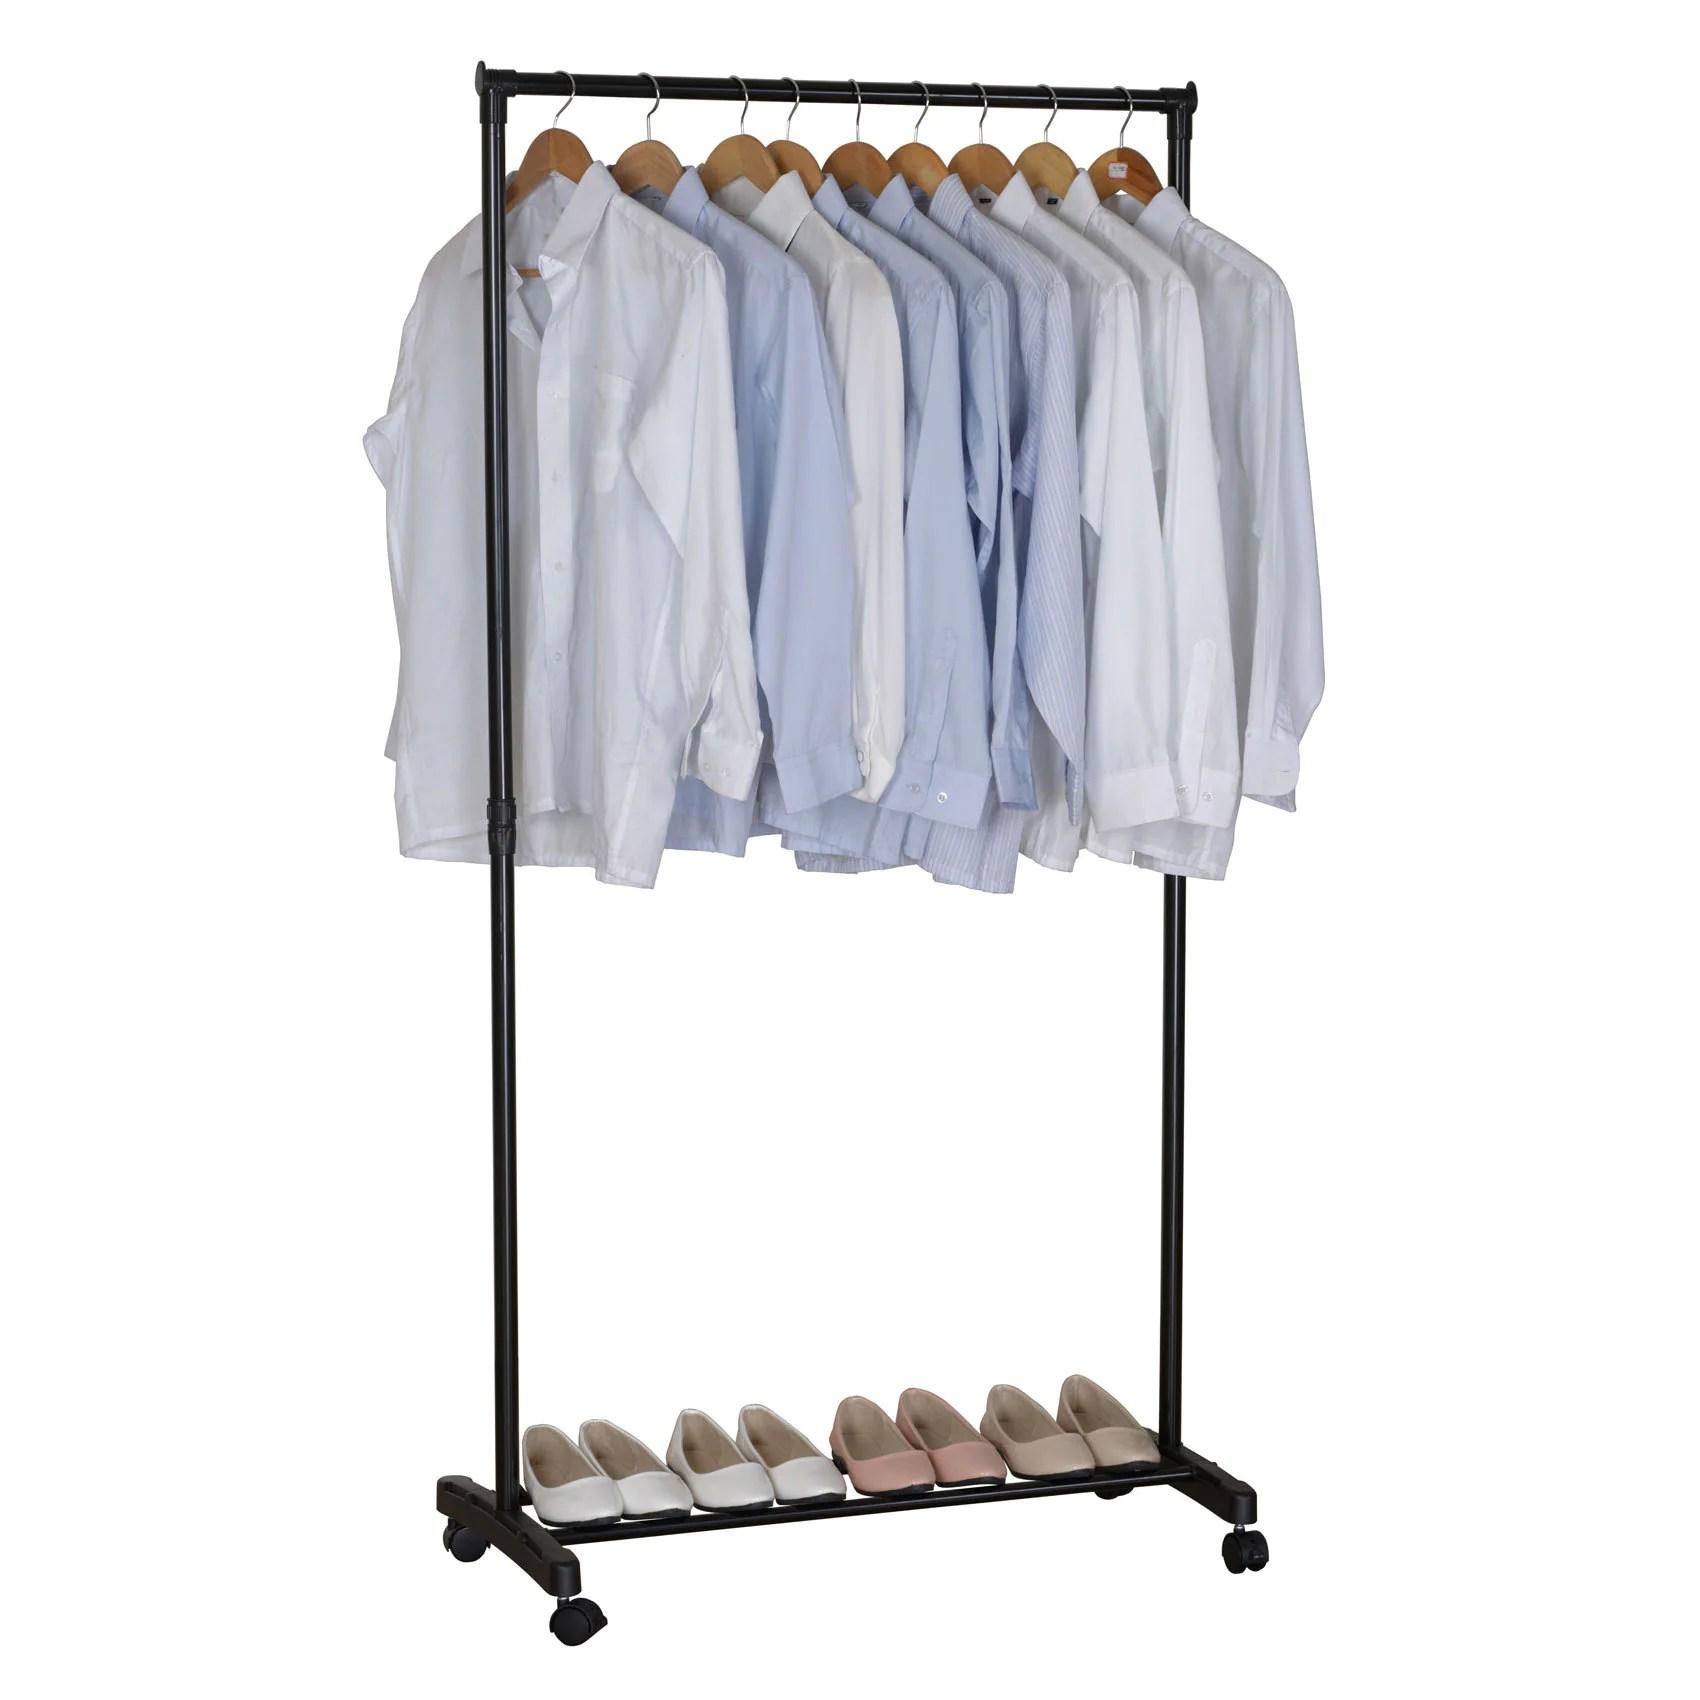 buy wt easy care garment rack hg 355 h157xl74 50xw41 5 online shop home garden on carrefour uae